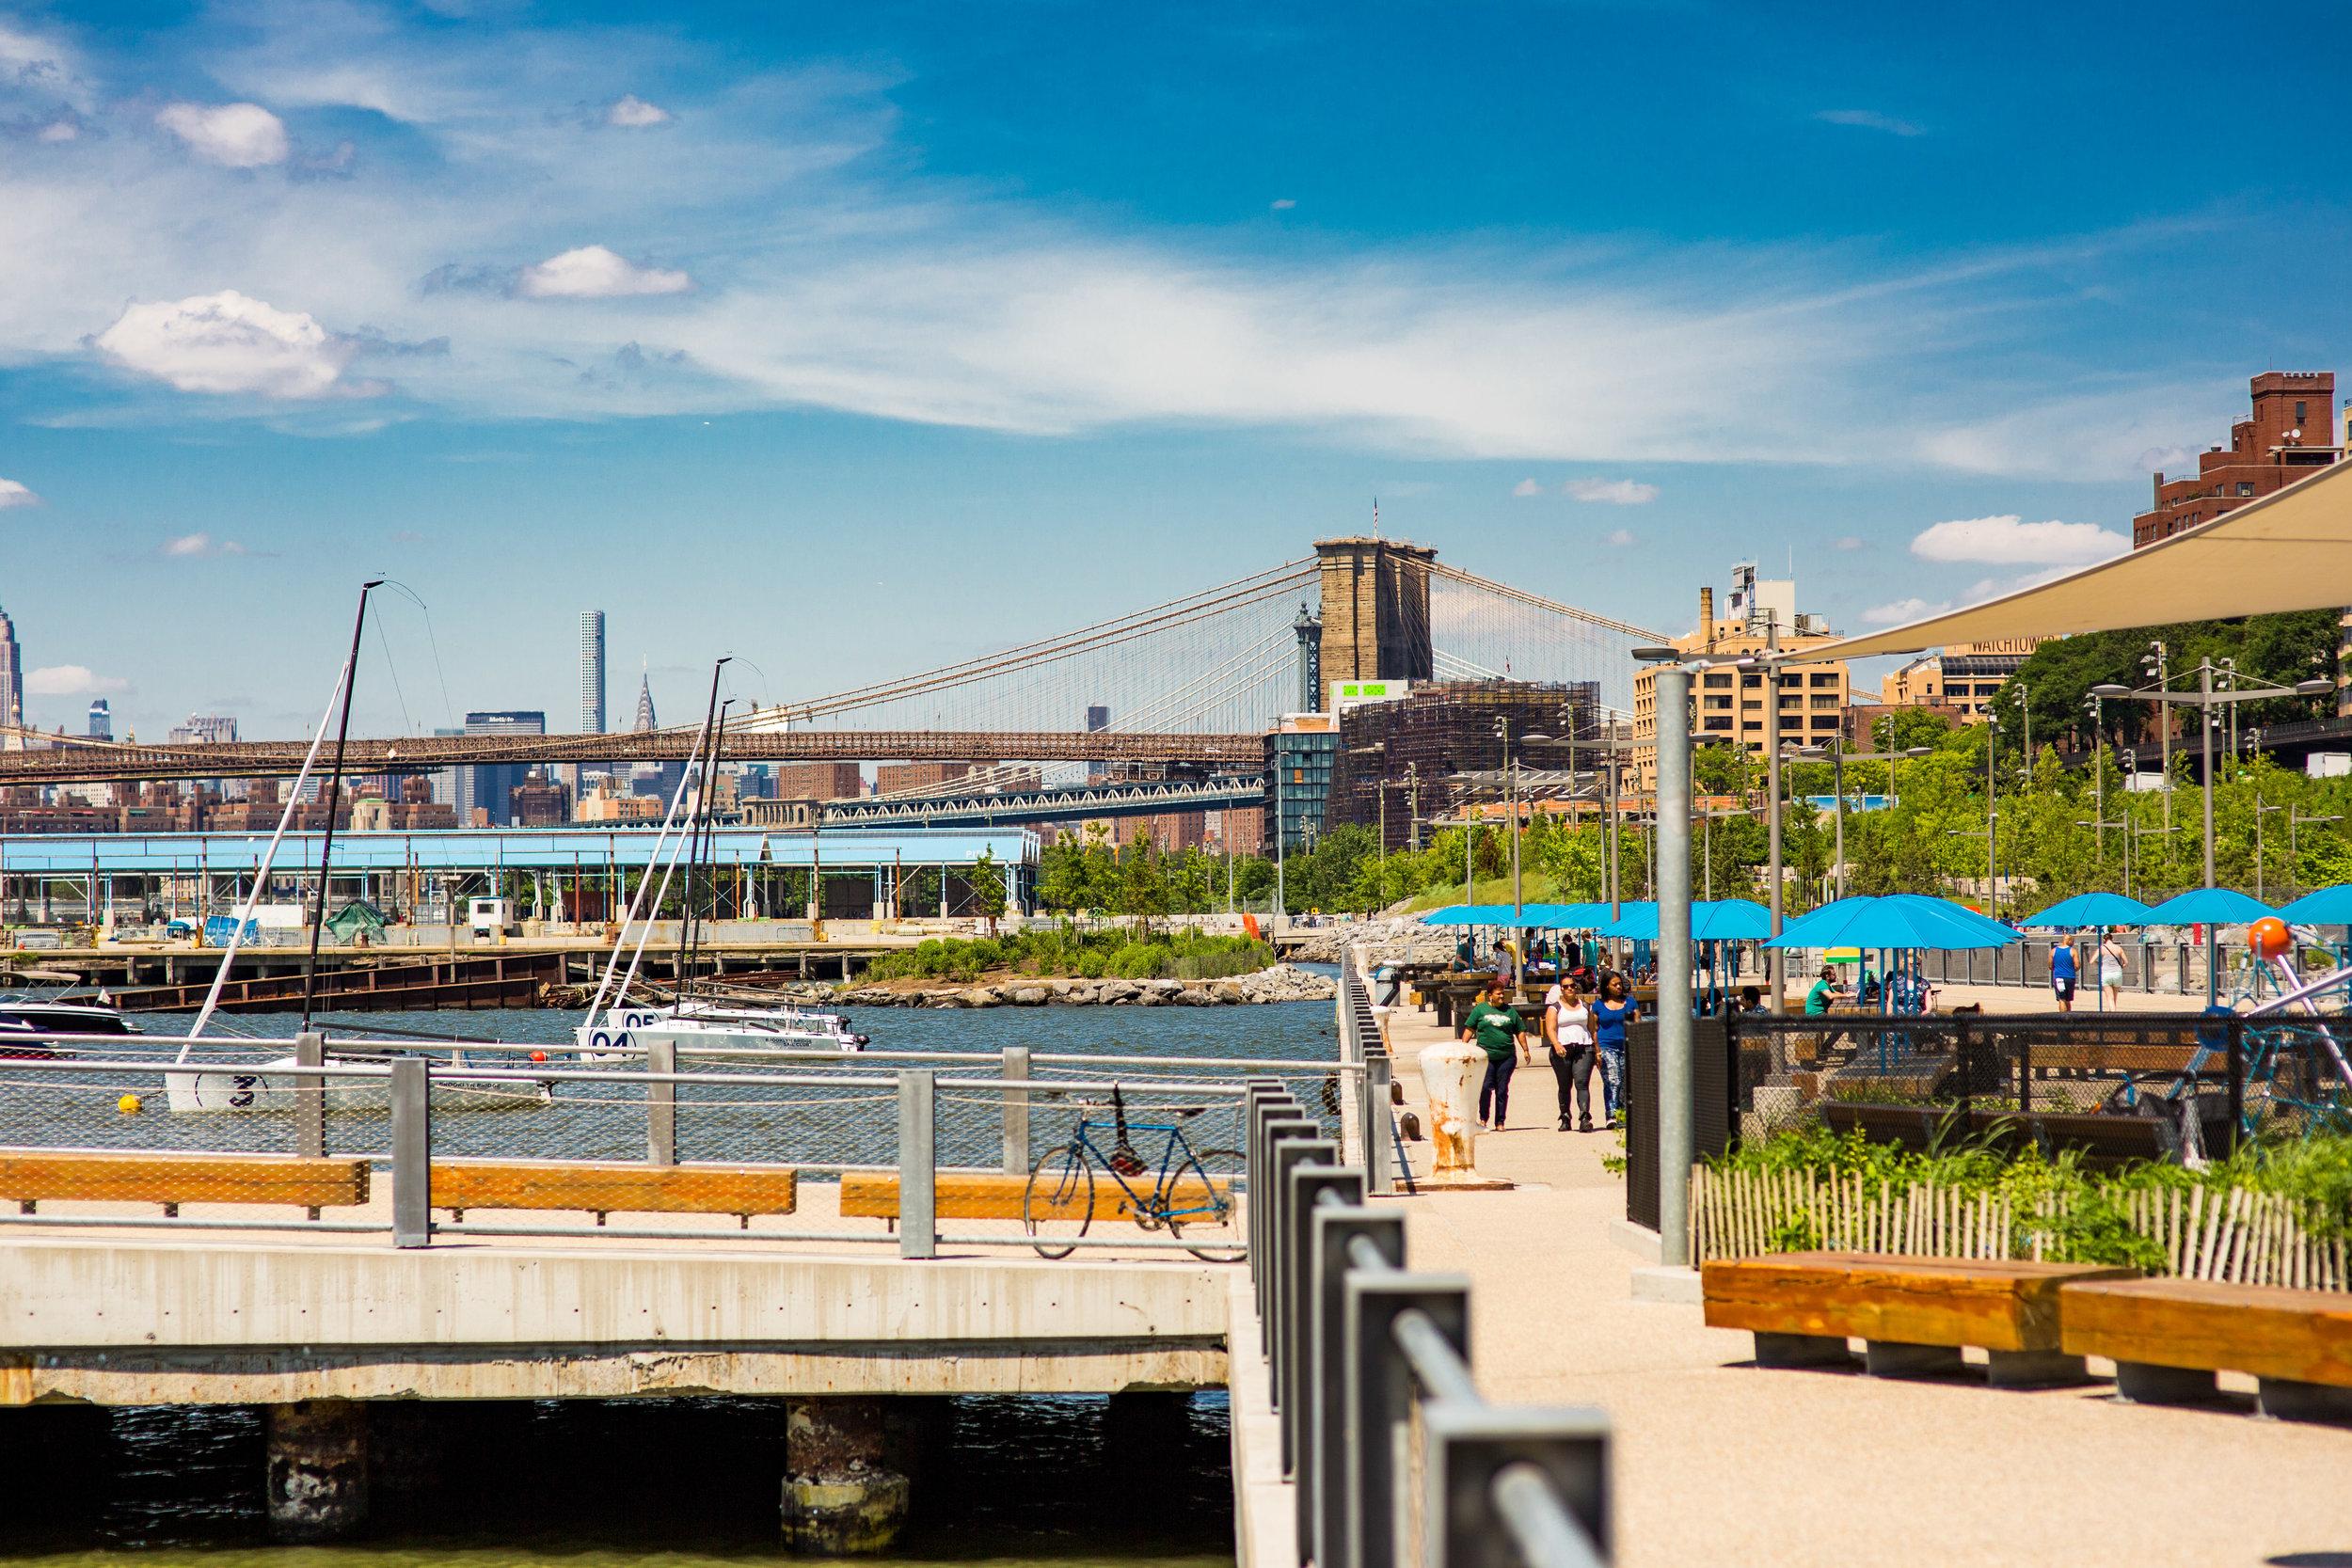 LSNY_Brooklyn_Bridge_Park-18.jpg